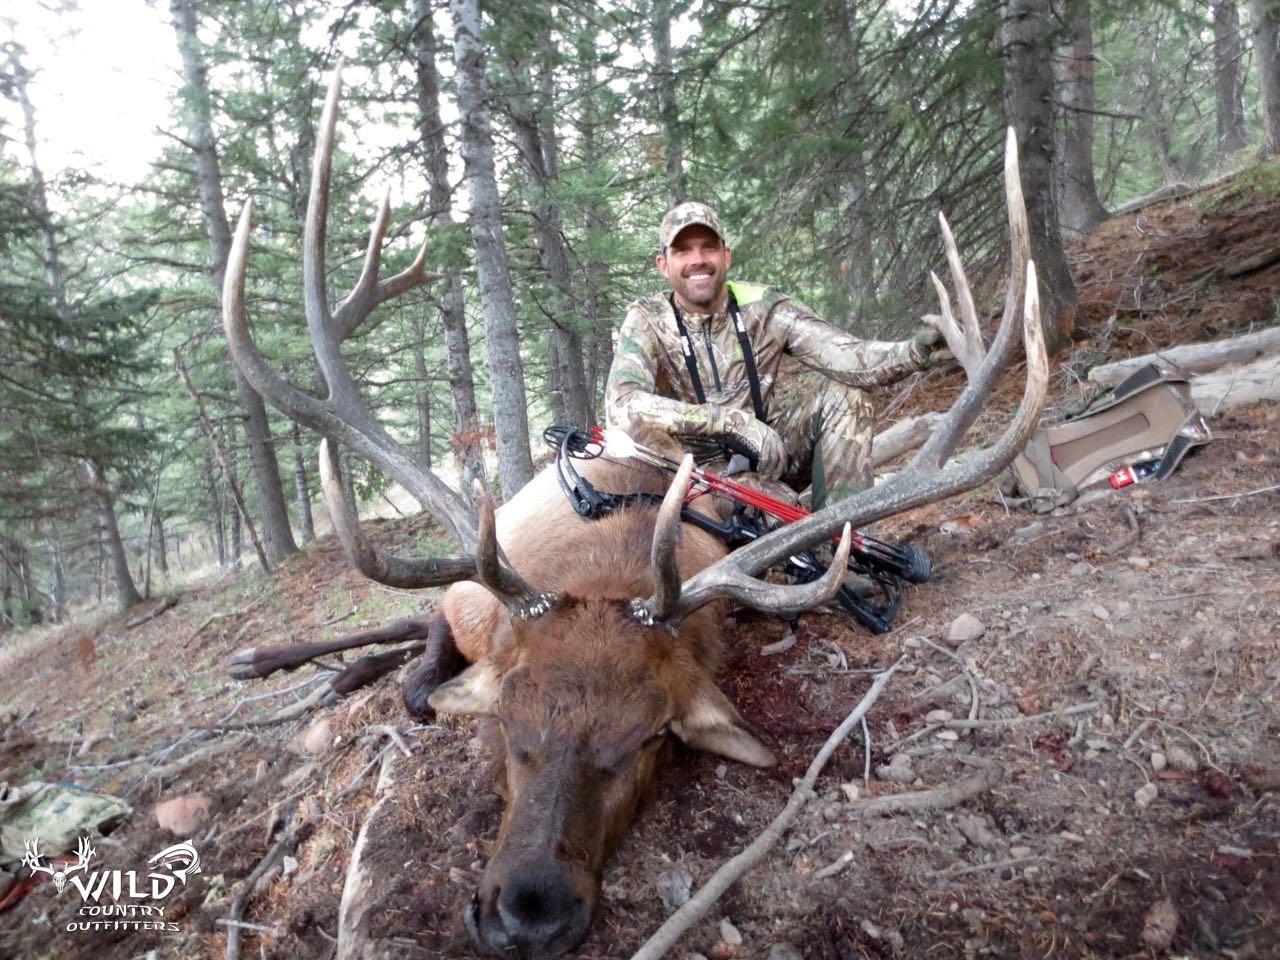 utah archery bull elk hunt lee lakosky the crush.jpg